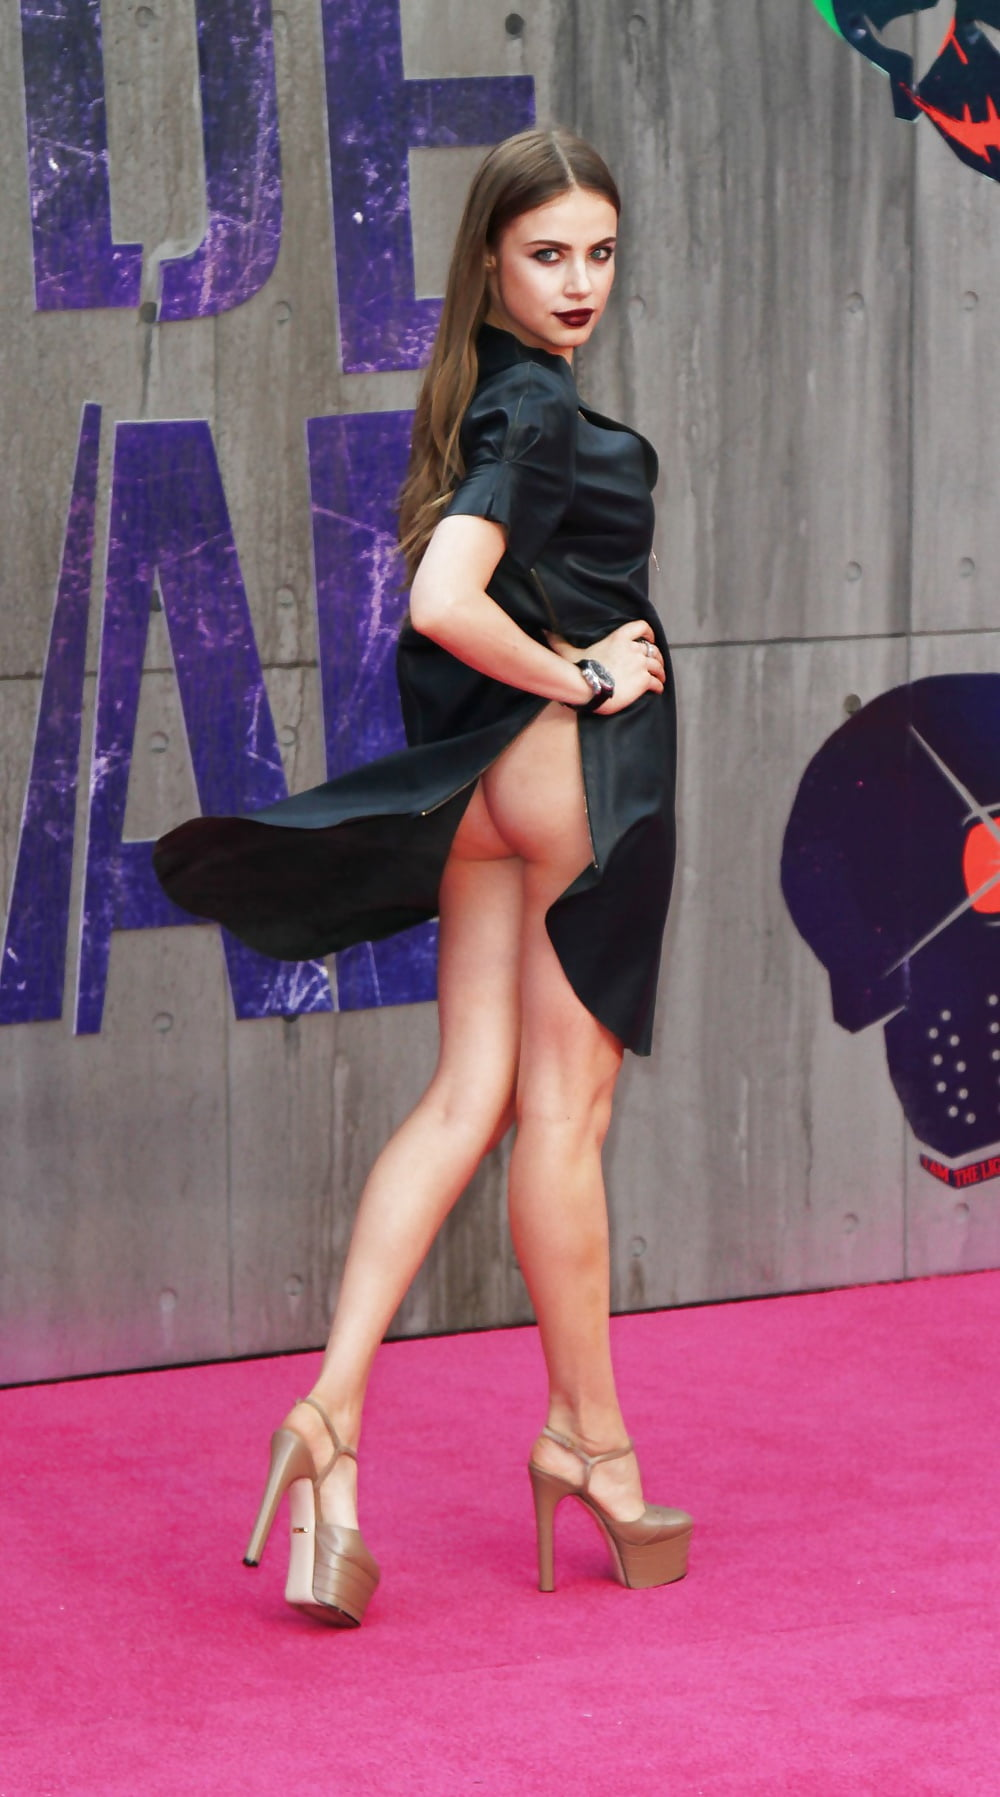 Sex Xenia Tchoumitcheva nude (62 photo), Topless, Bikini, Feet, panties 2019